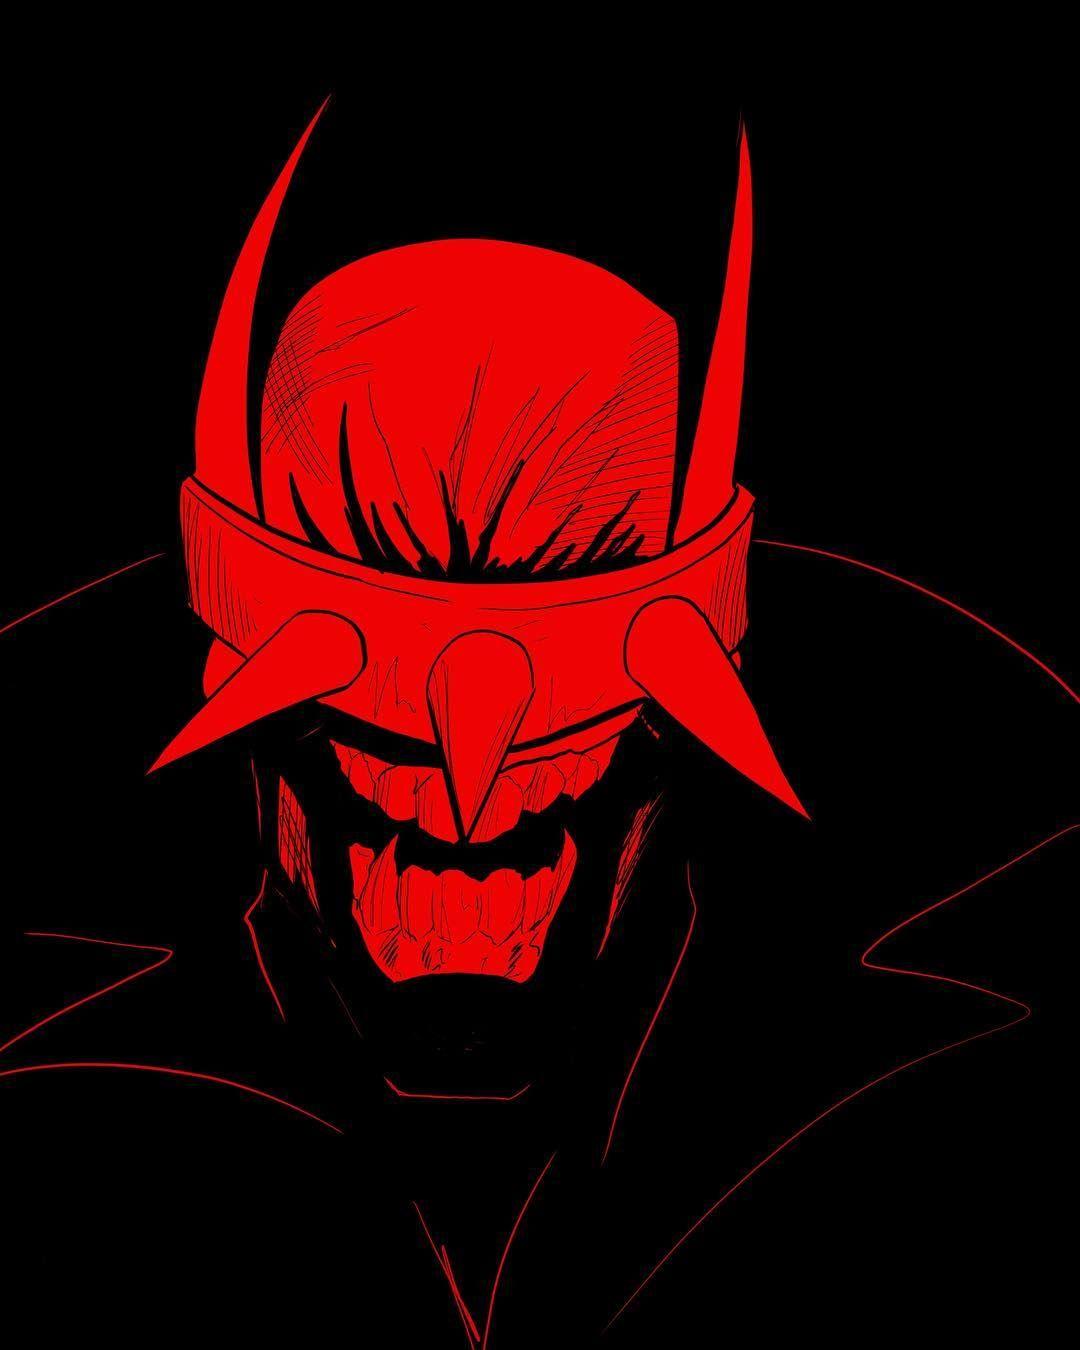 Pin de Vampire Angel13 en The Batman Who Laughs   Pinterest